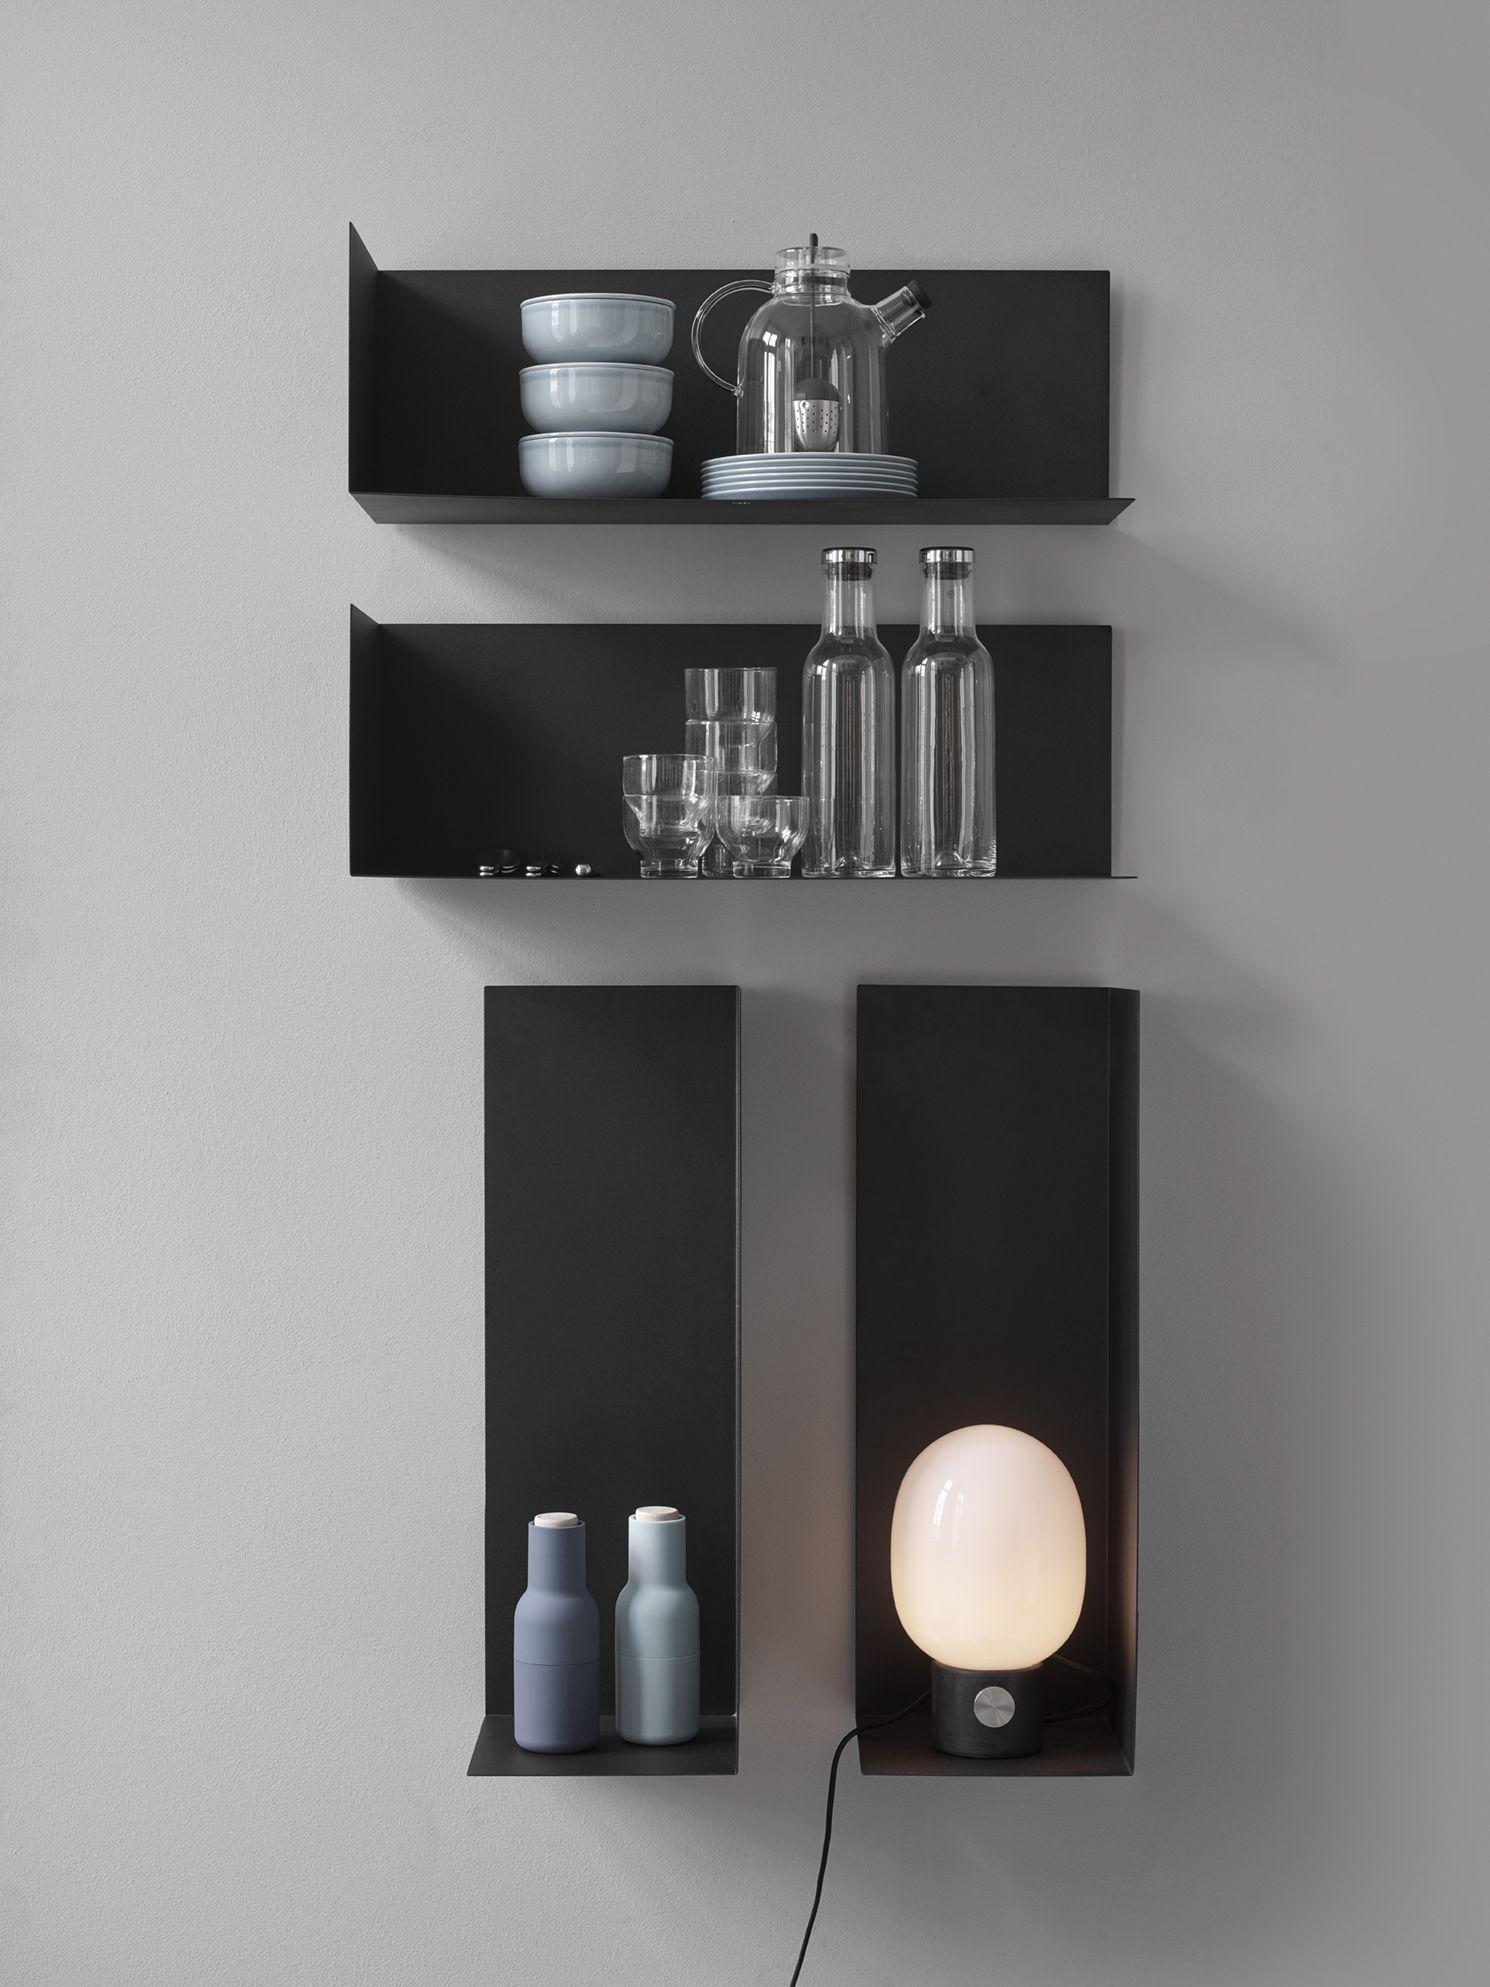 Menu Item Corner Shelves Image Yellowsstudio Modernism Reimagnied Shelving Design Shelves Menu Furniture